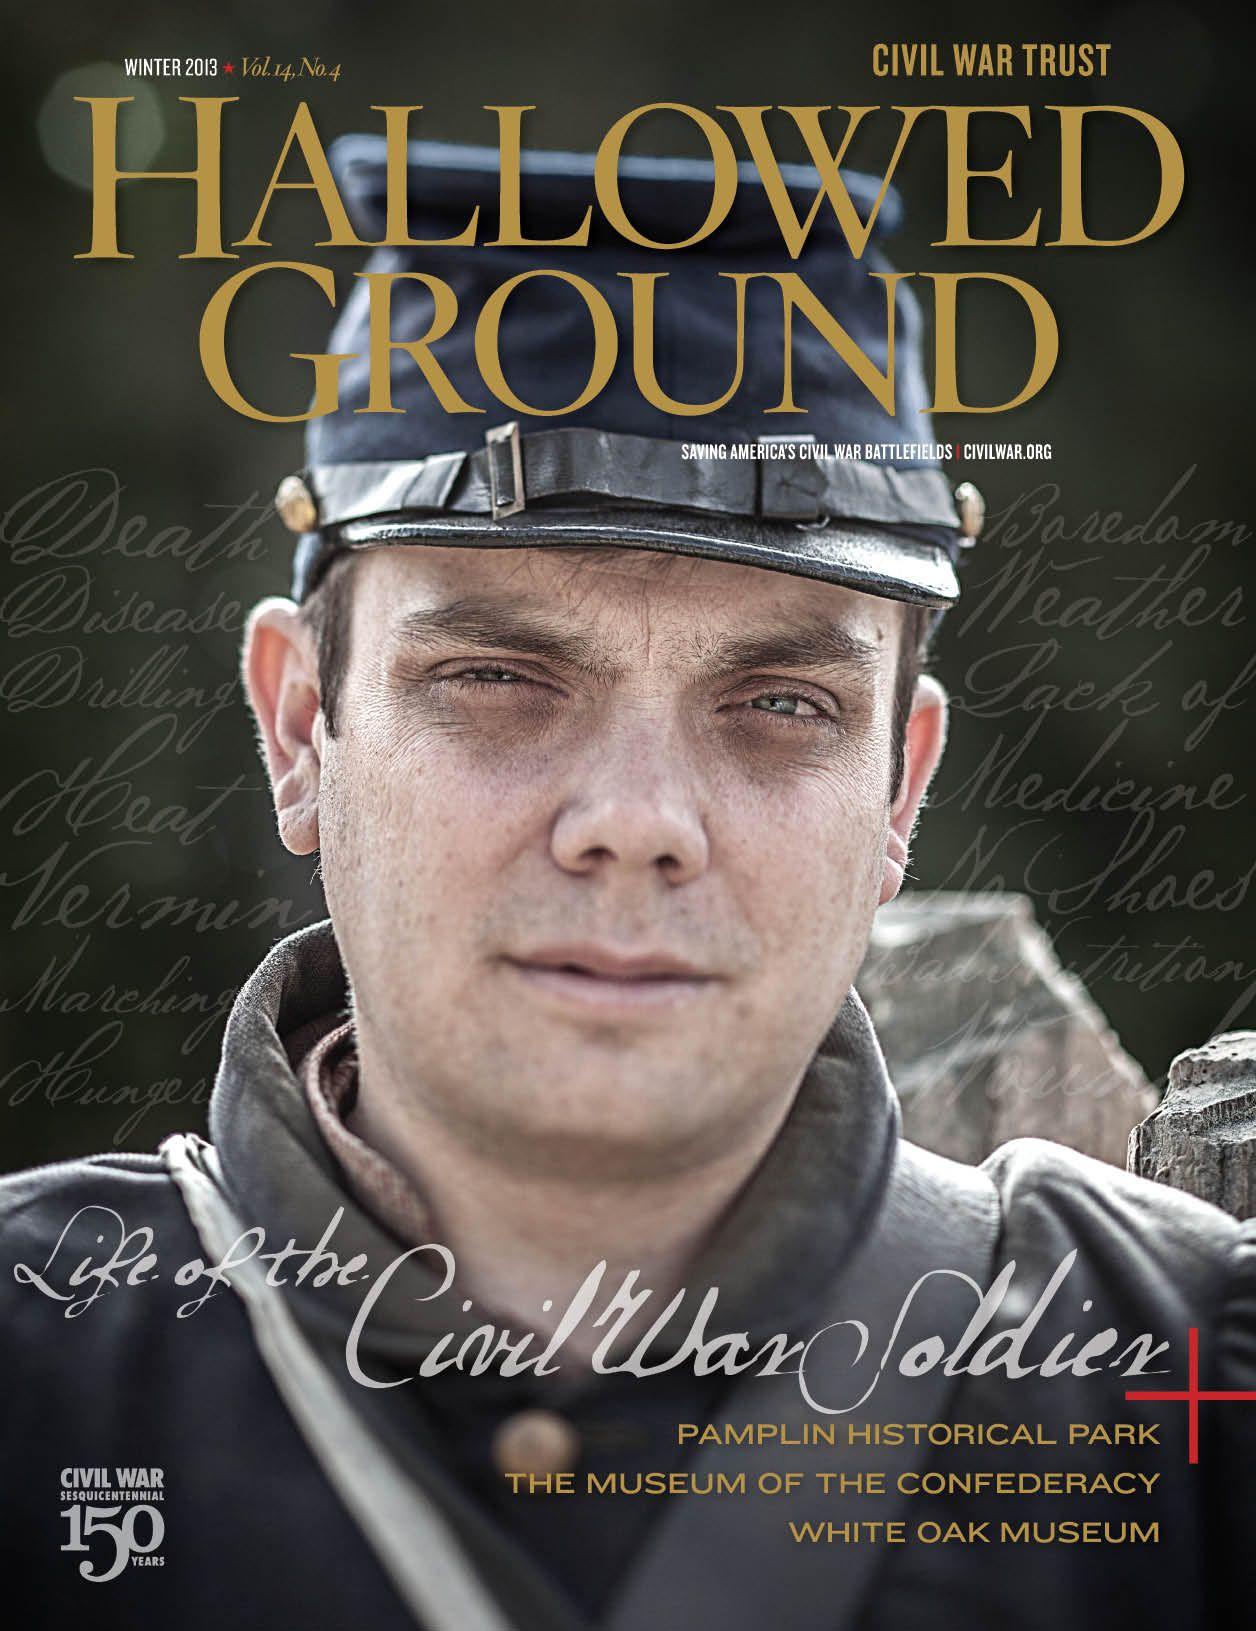 hallowed ground, Civil War Trust, cool typography, award